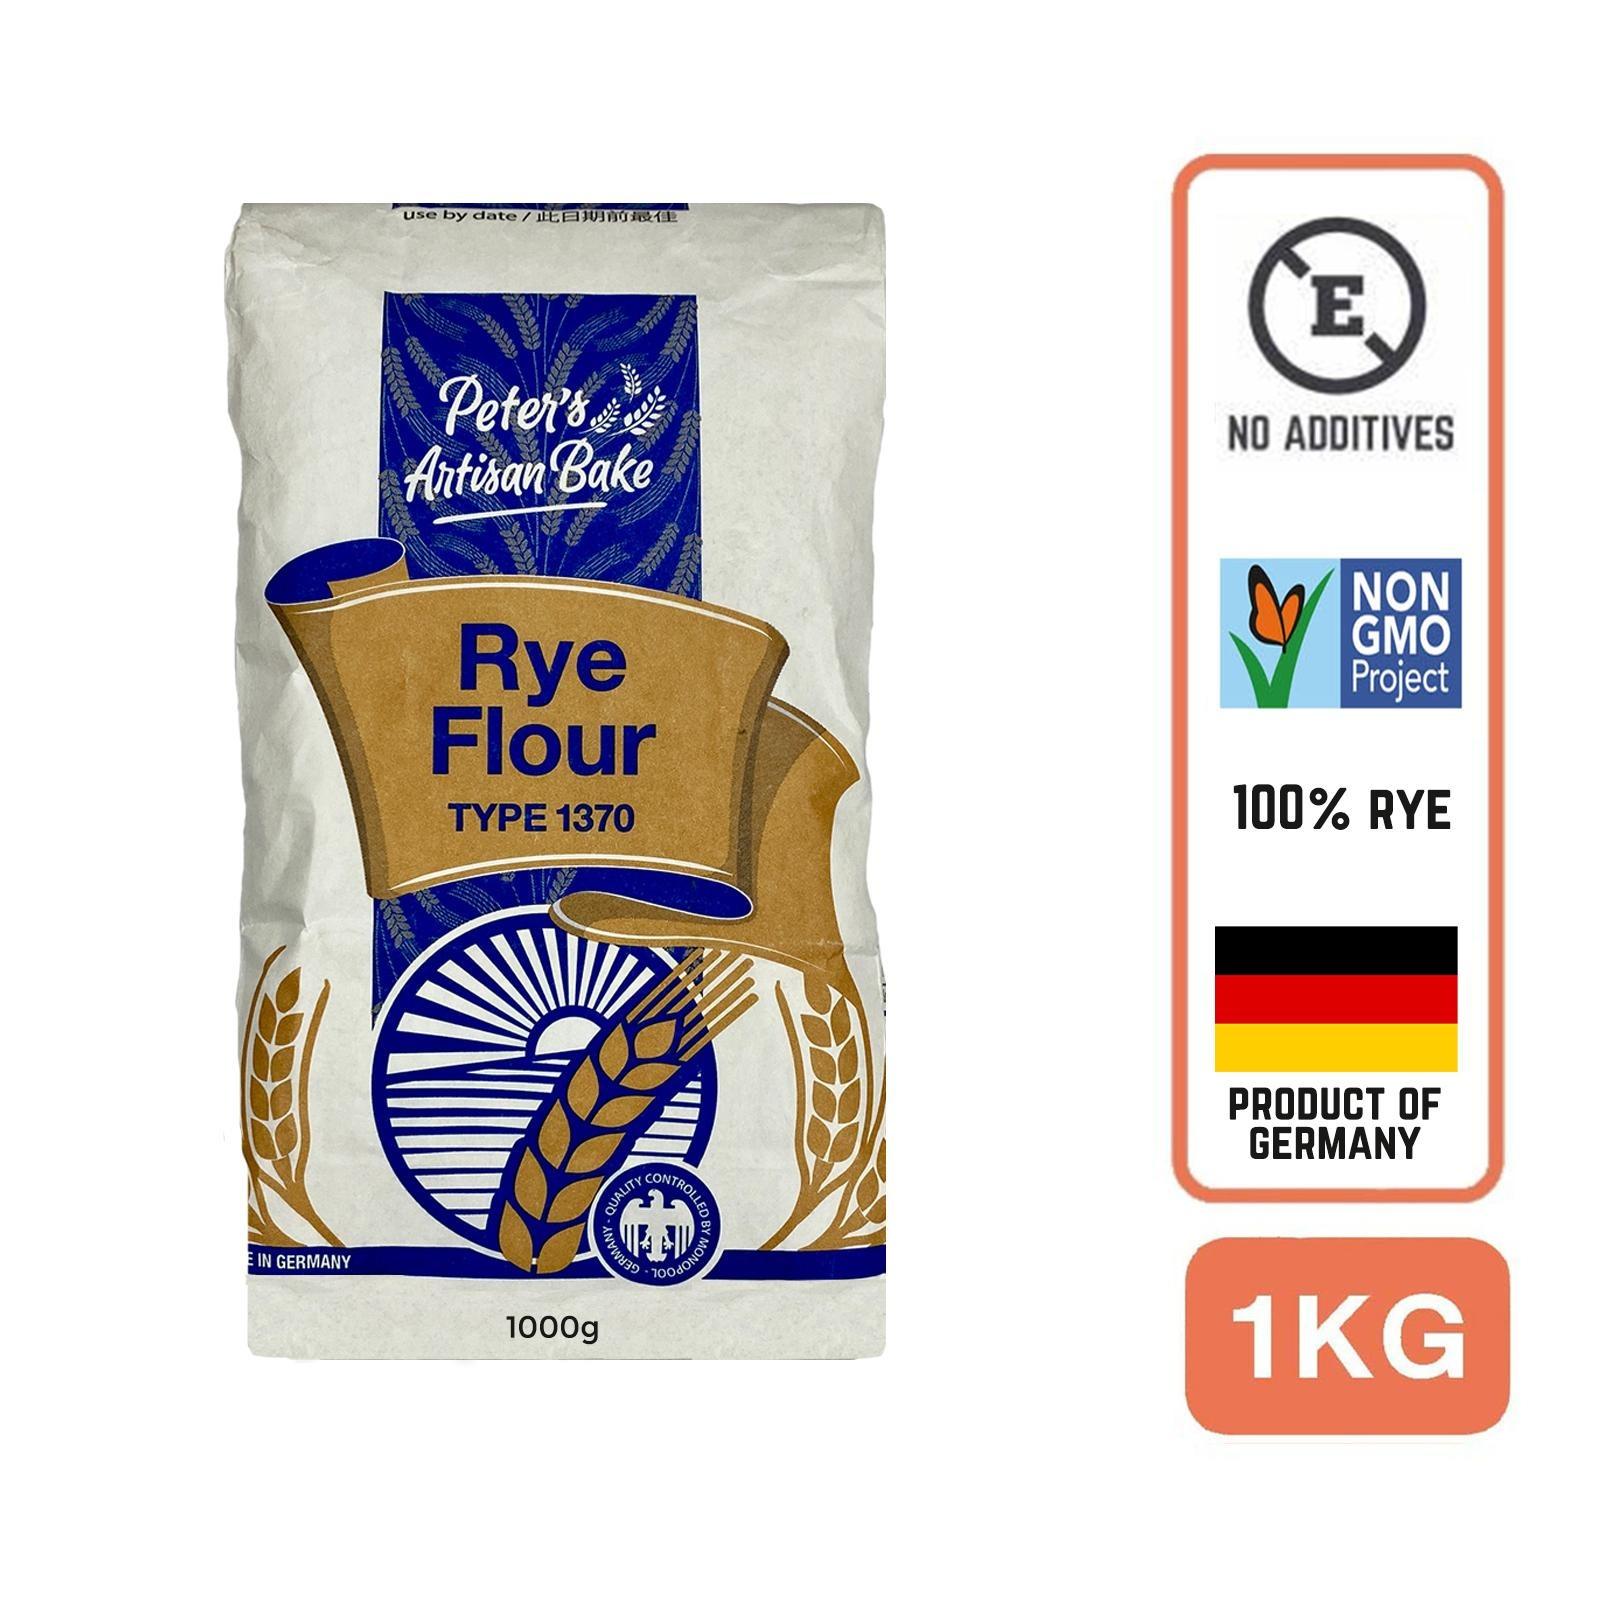 Peter's Artisan Bake Rye Flour